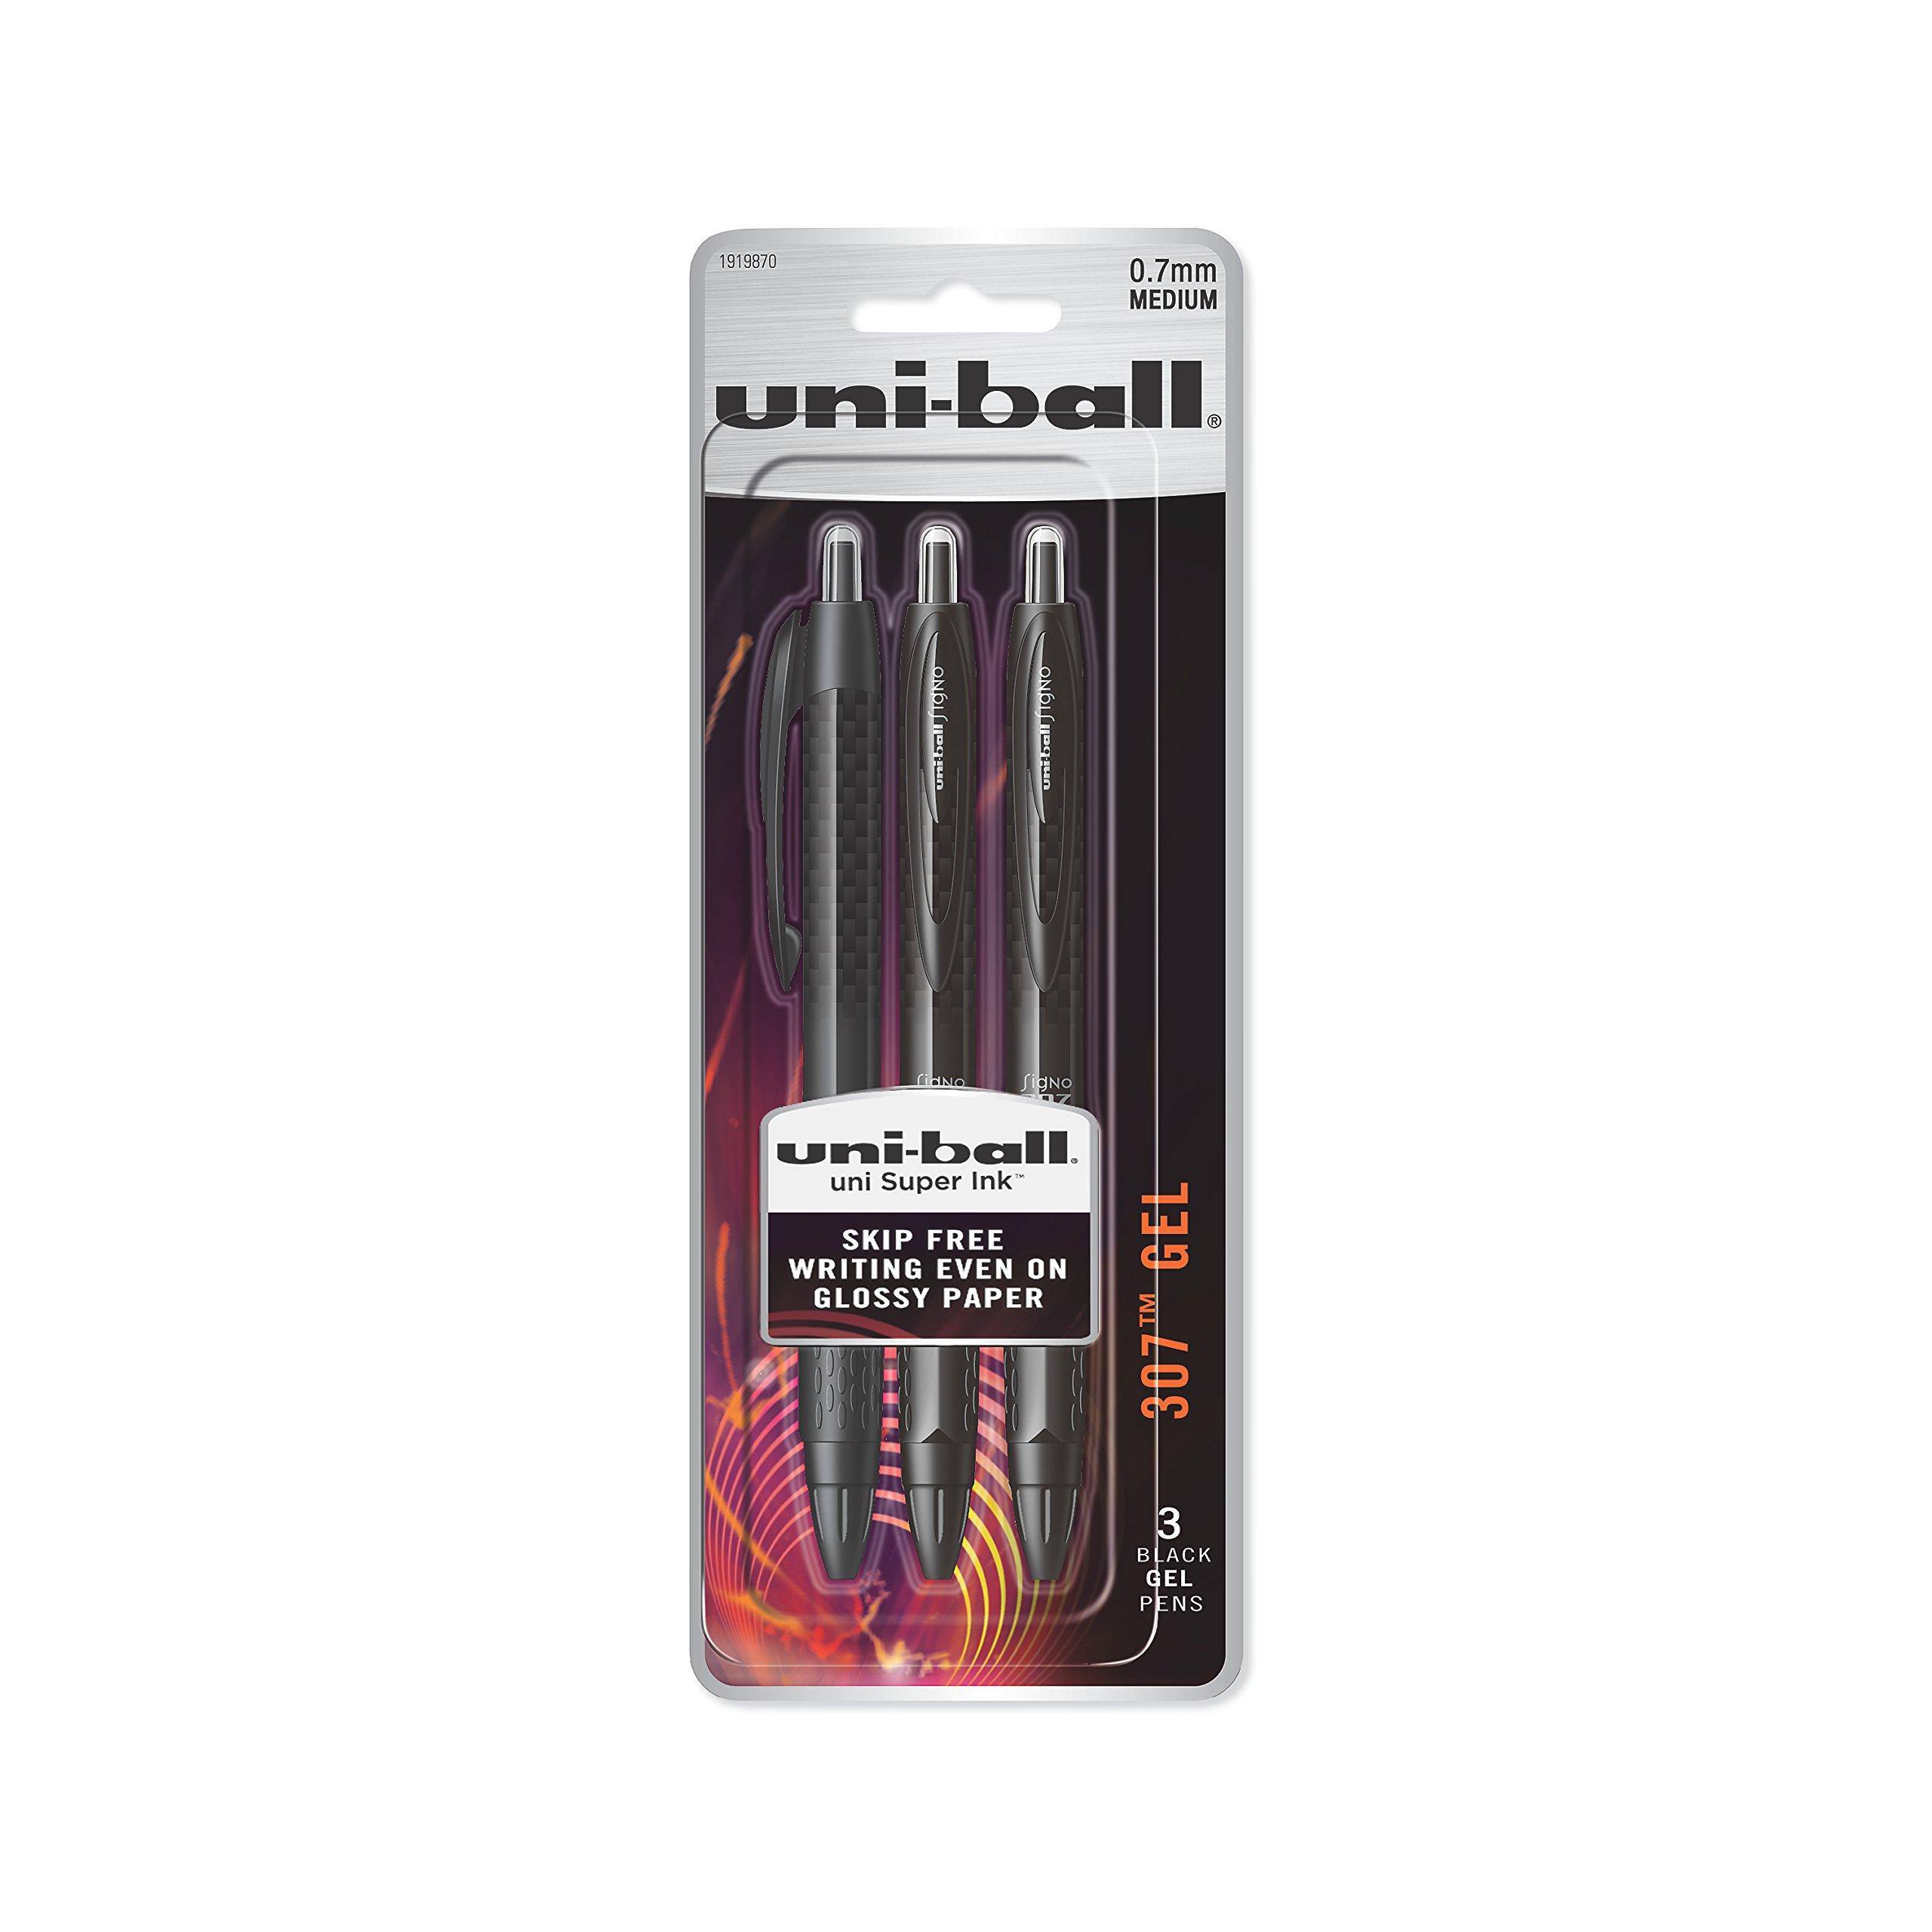 uni-ball 307 Retractable Gel Pens, Medium Point (0.7mm), Black, 3 Count